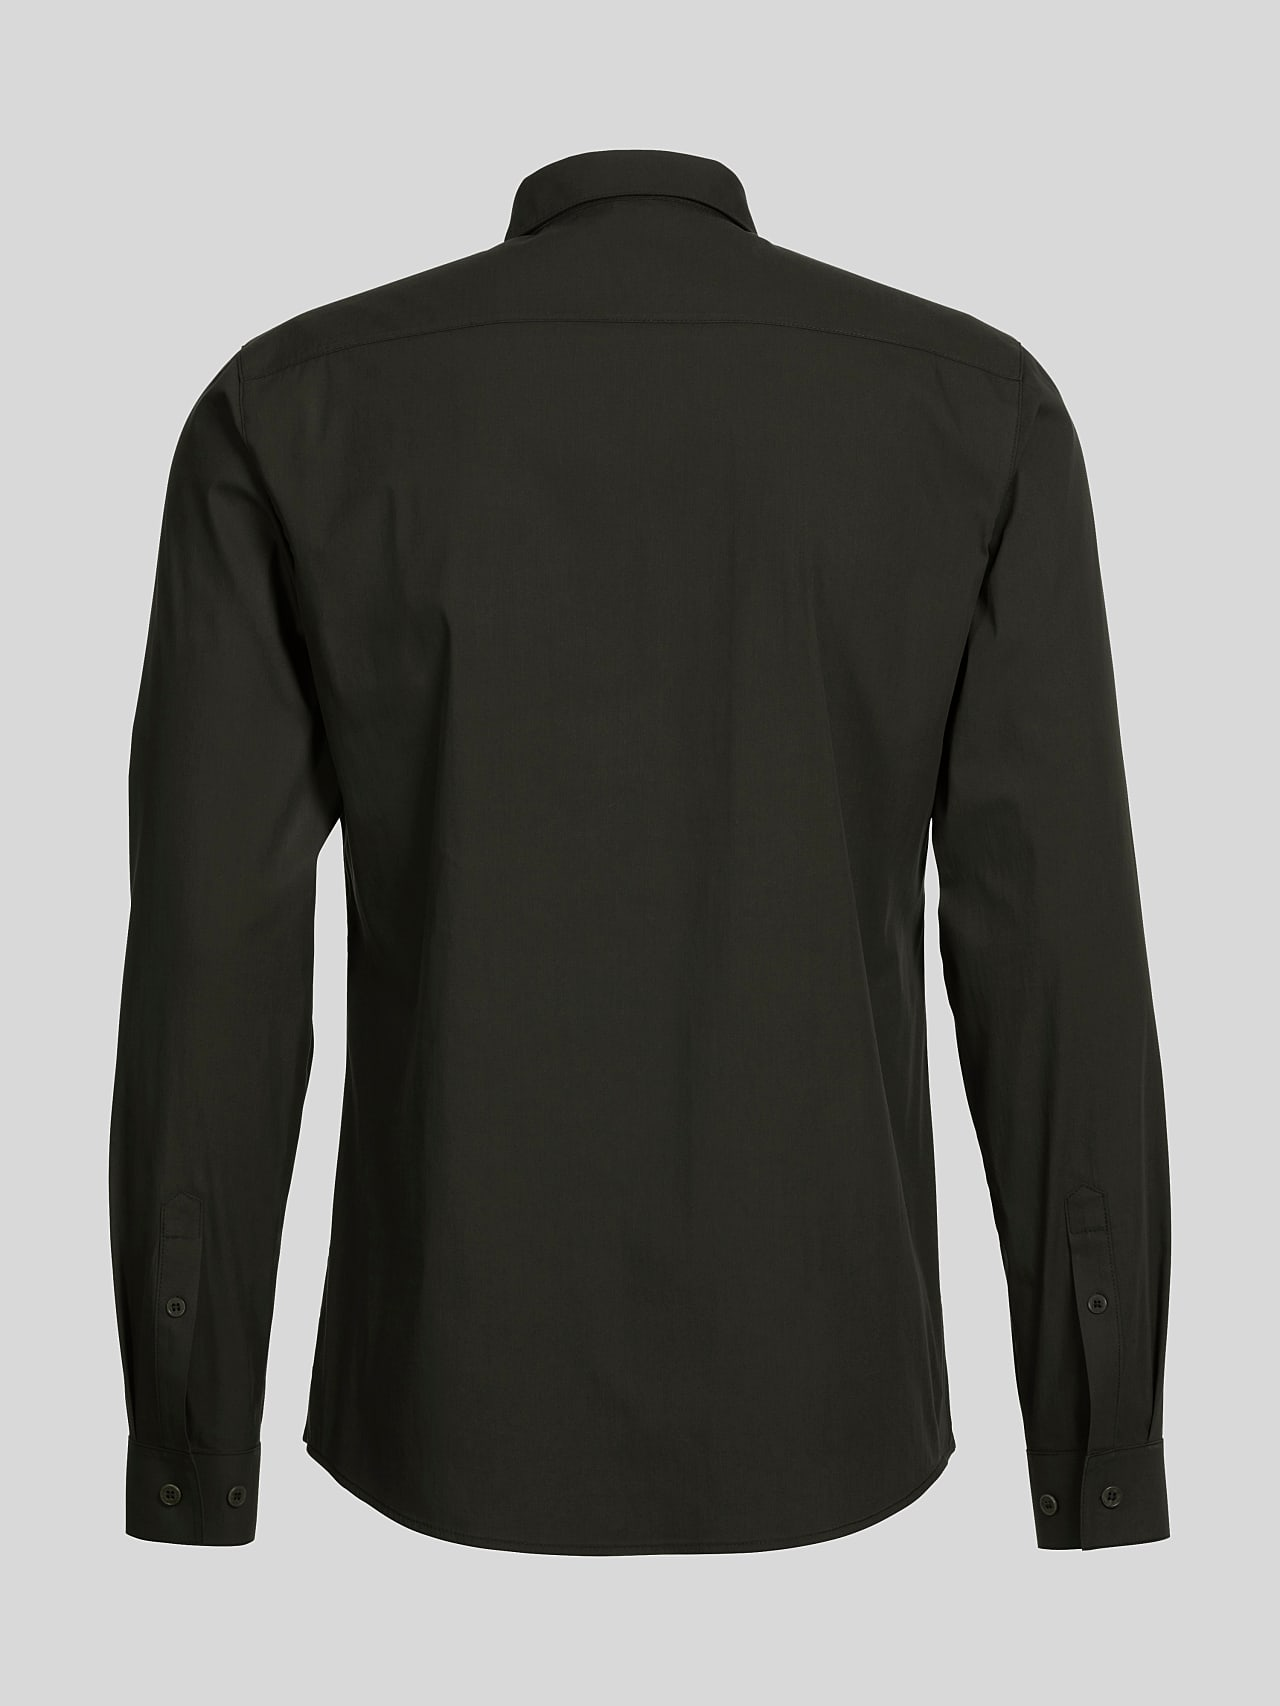 WAARG V1.Y5.01 Cotton-Stretch Shirt olive Left Alpha Tauri